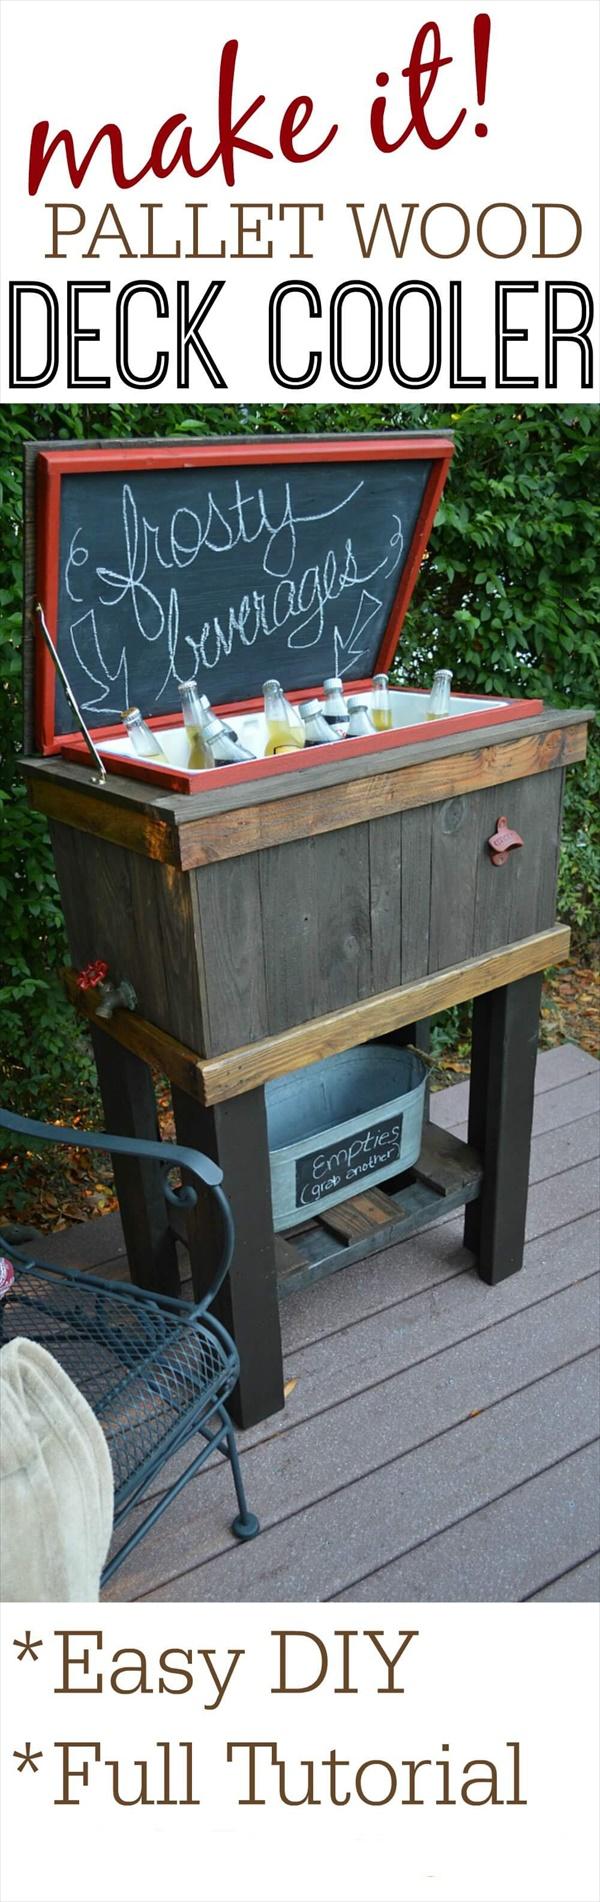 Hilarious Diy Outdoor Bar Ideas Homebnc Diy Outdoor Bar Ideas That Will Beautifyyour Outdoor Diy Outdoor Bar Ideas That Will Beautify Your Outdoor Diy Home Decor houzz-02 Outdoor Bar Ideas